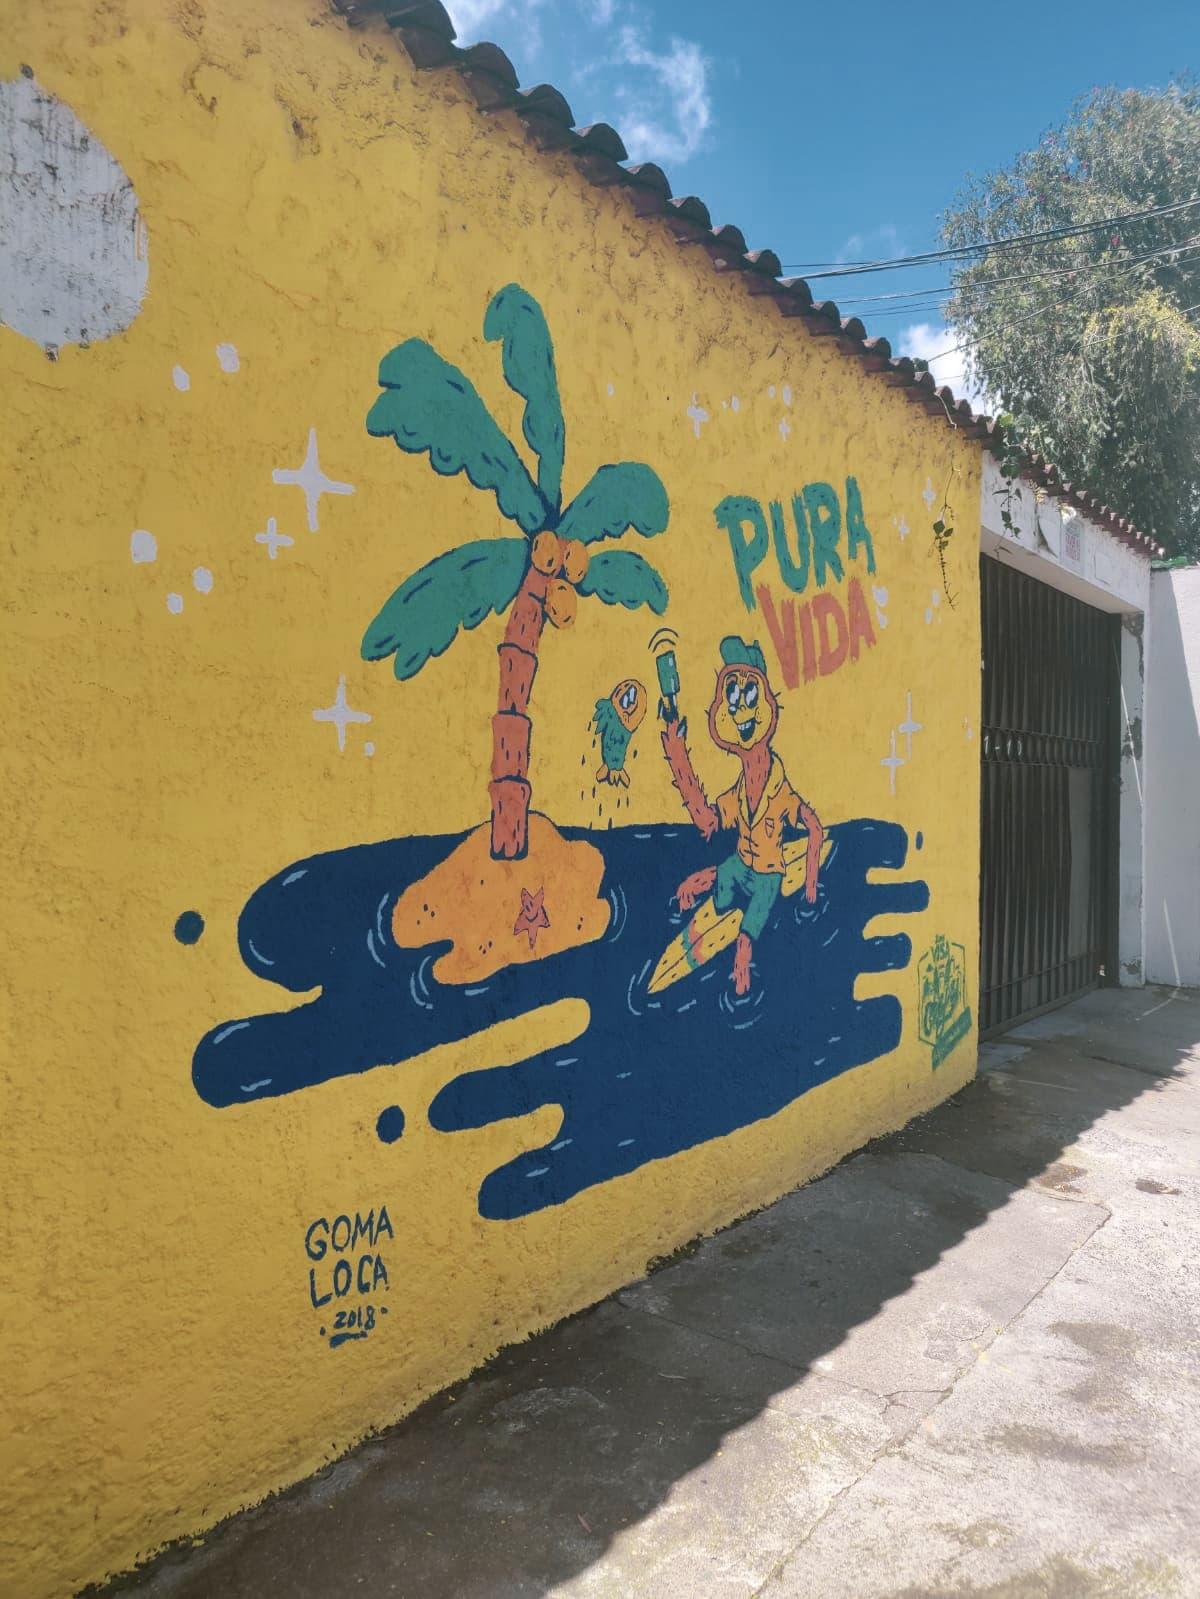 Pura Vida Graffiti in Straßen von San Jose